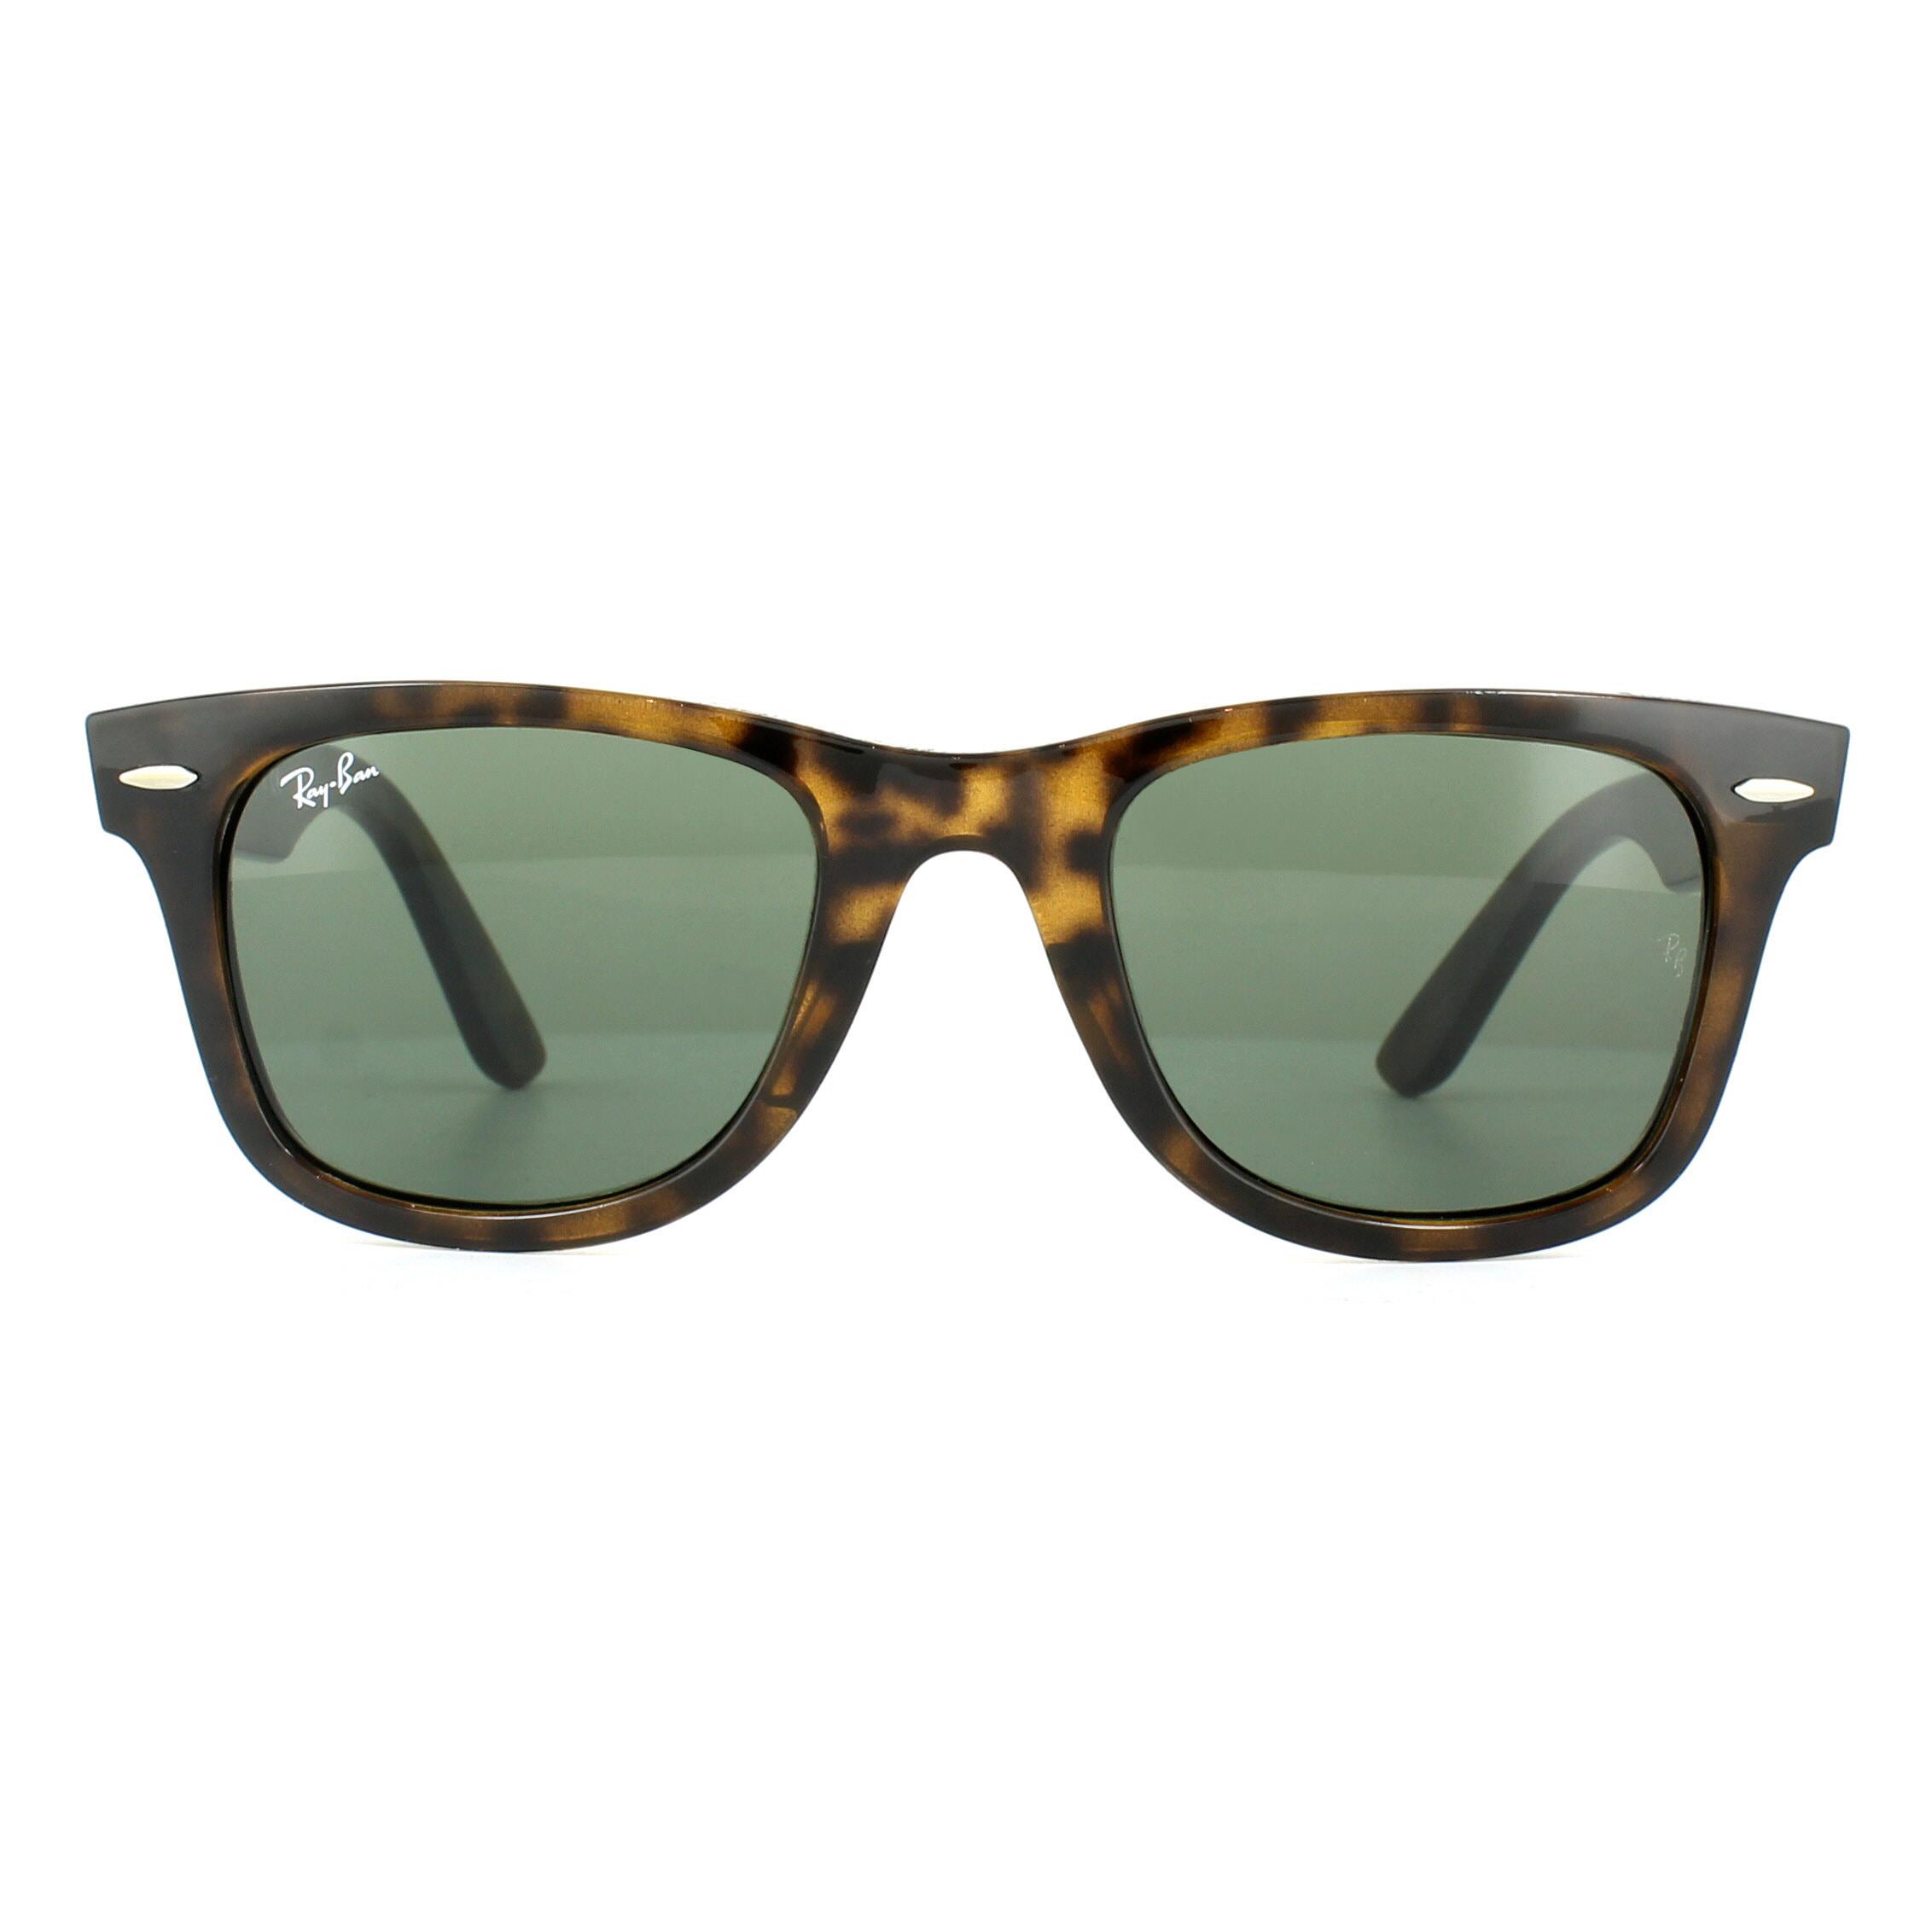 467eecc70f CENTINELA Ray-Ban gafas de sol Wayfarer facilidad RB4340 710 tortuga verde  G-15